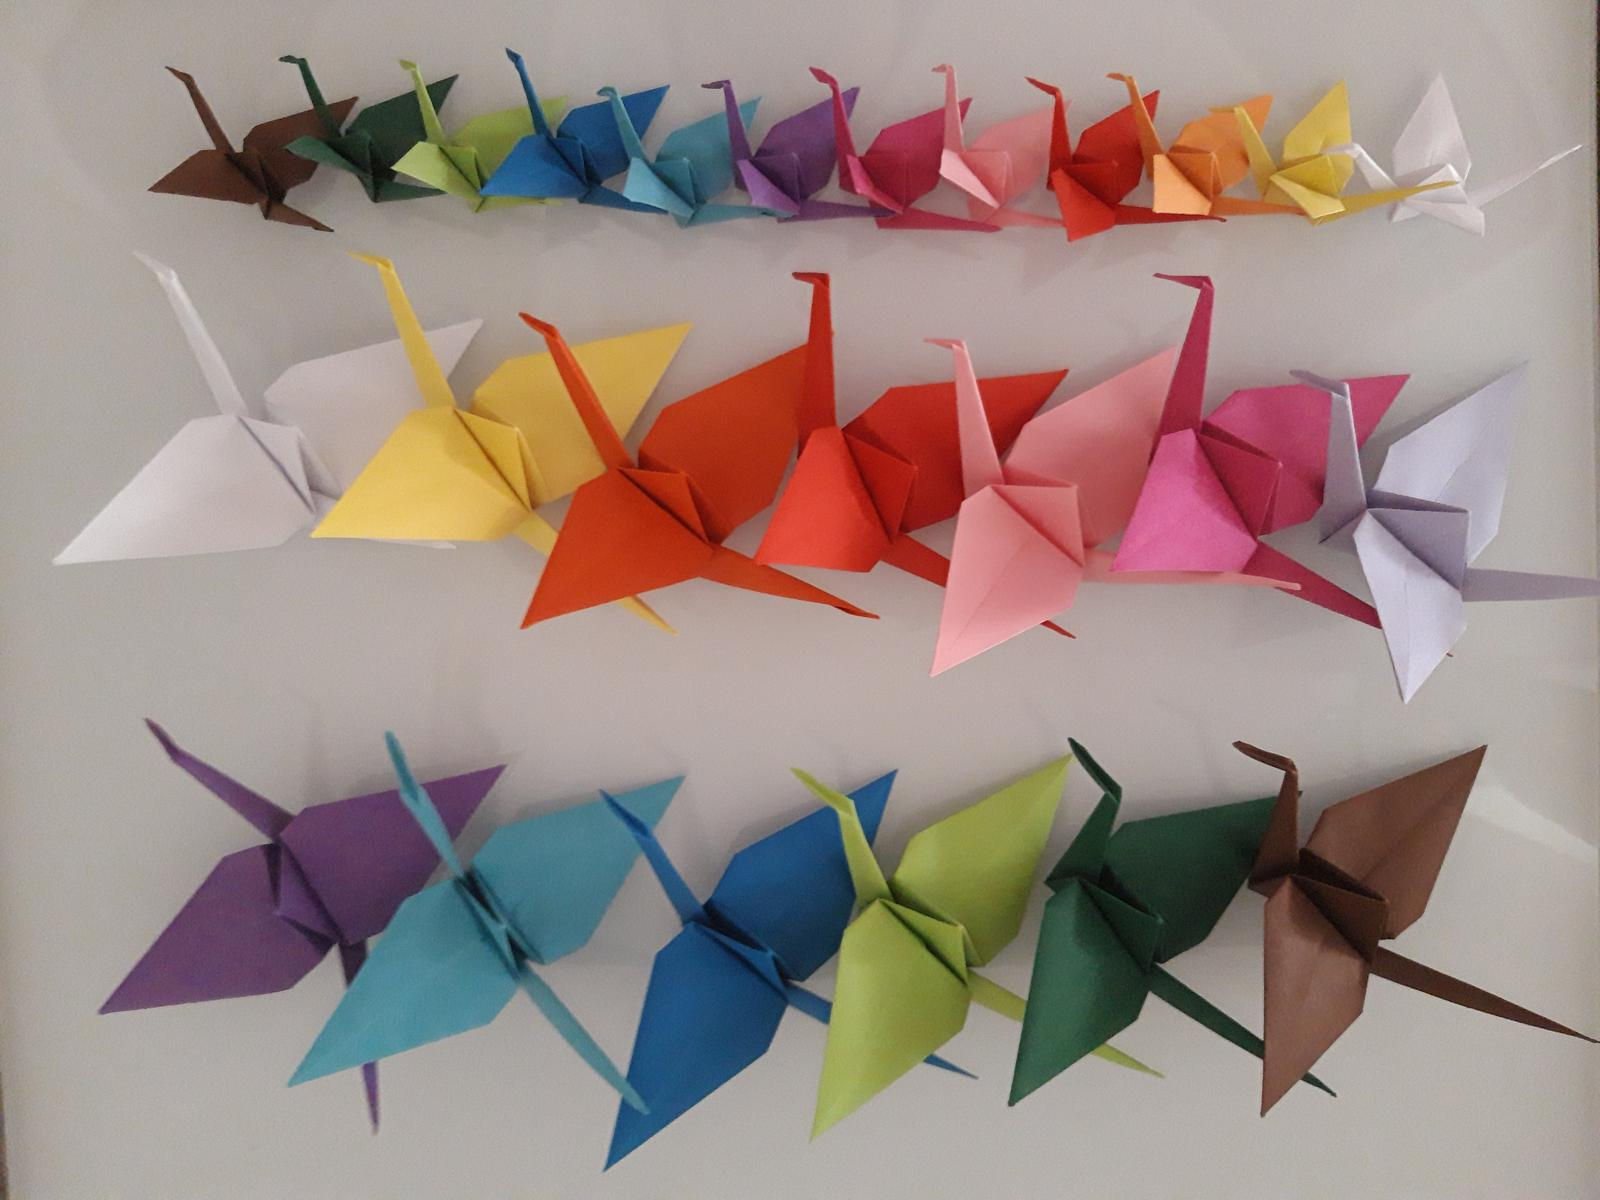 Origami jeřábi dekorace  - Obrázek č. 2